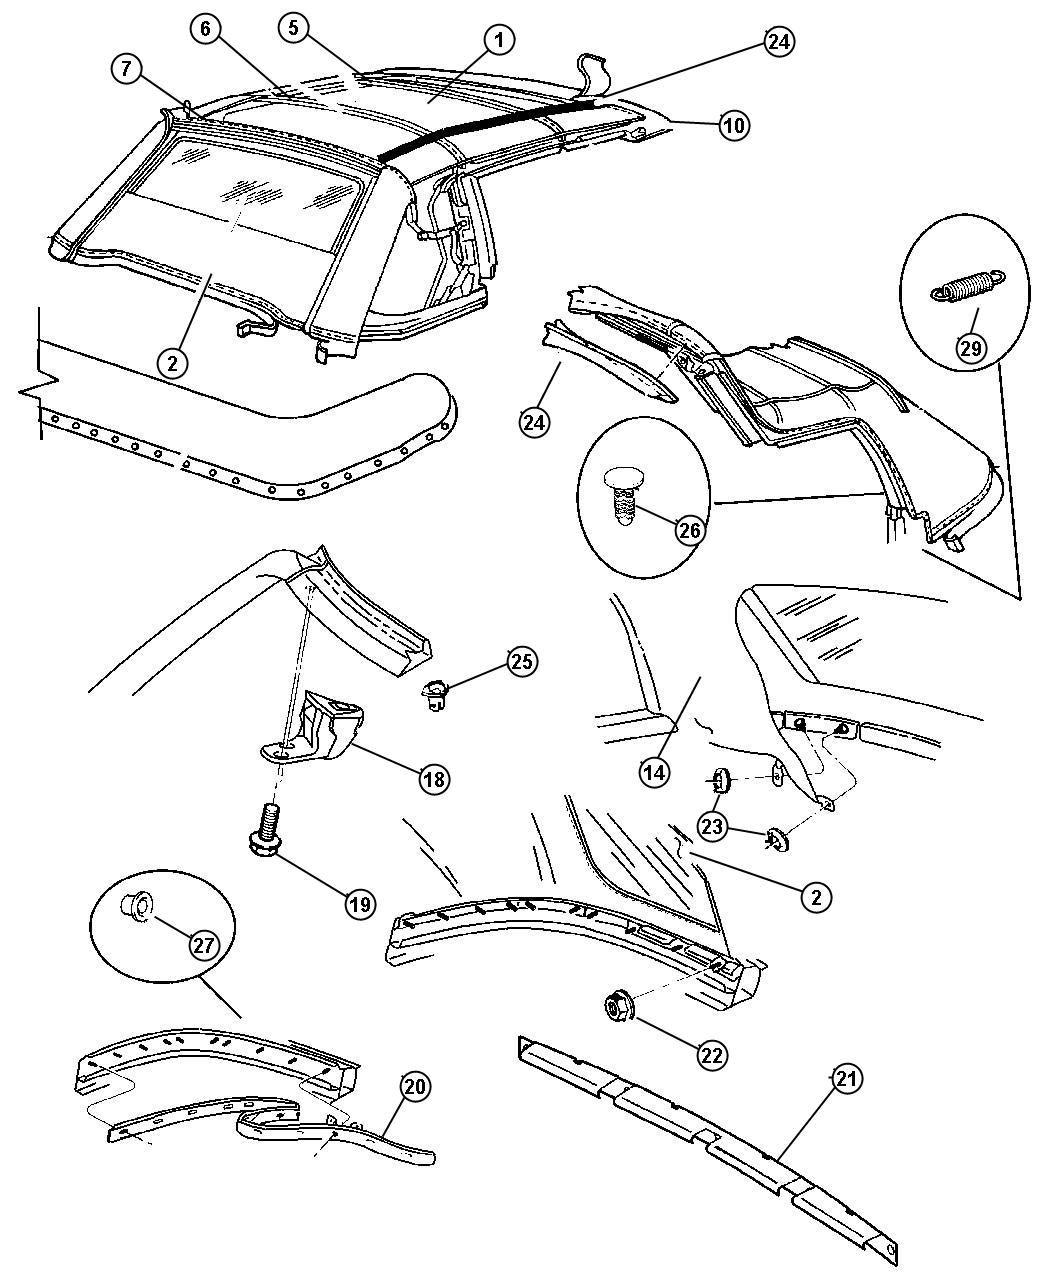 fuse box diagram as well chrysler sebring fuse box diagram moreover